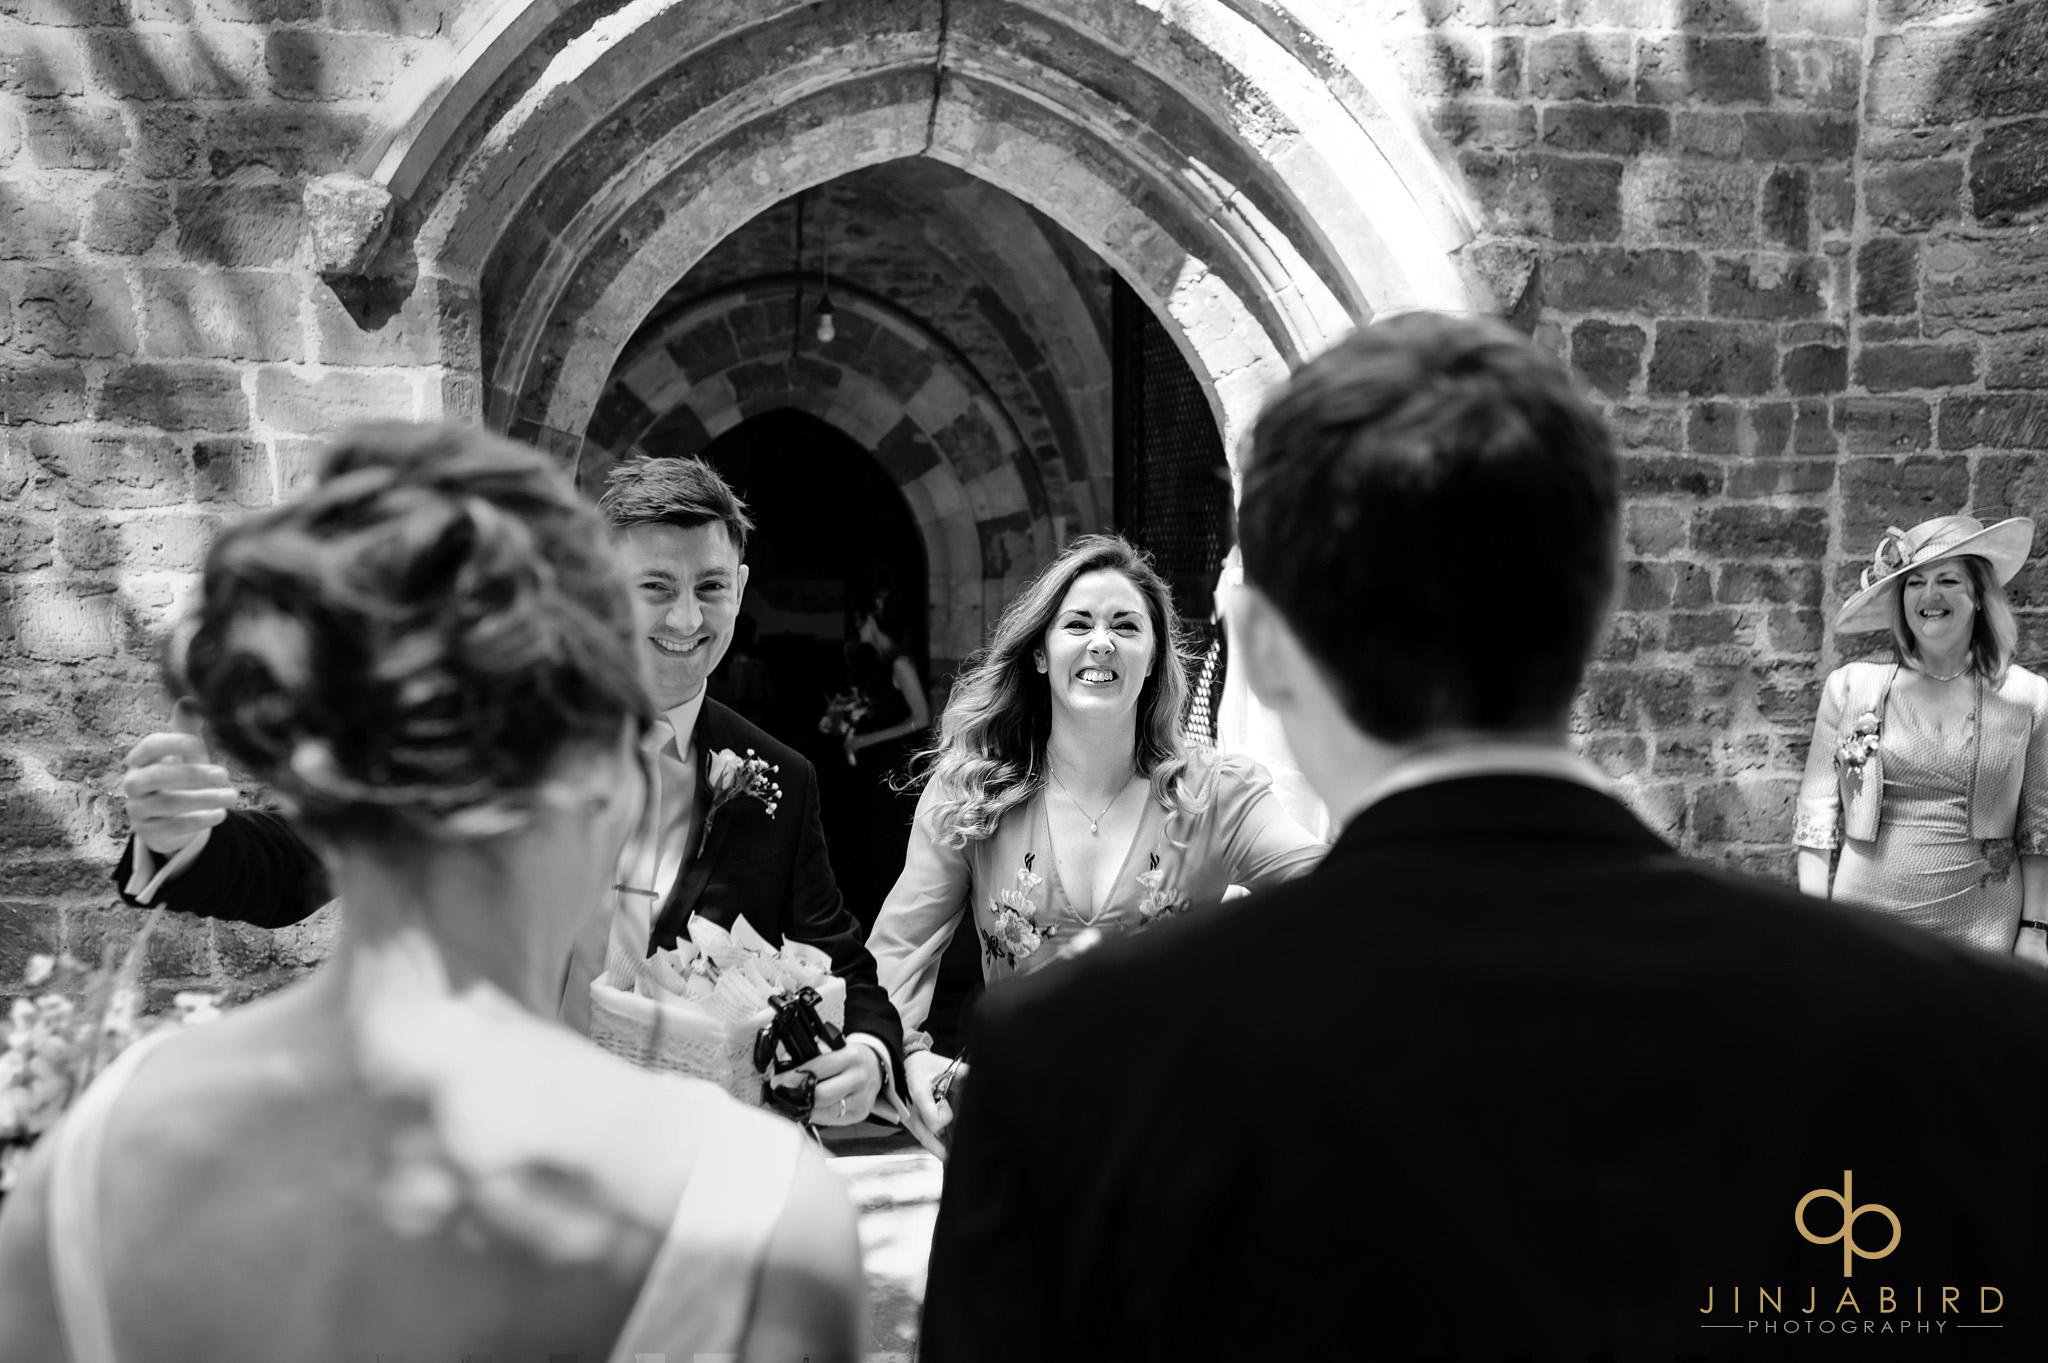 wedding guests greet bride and groom